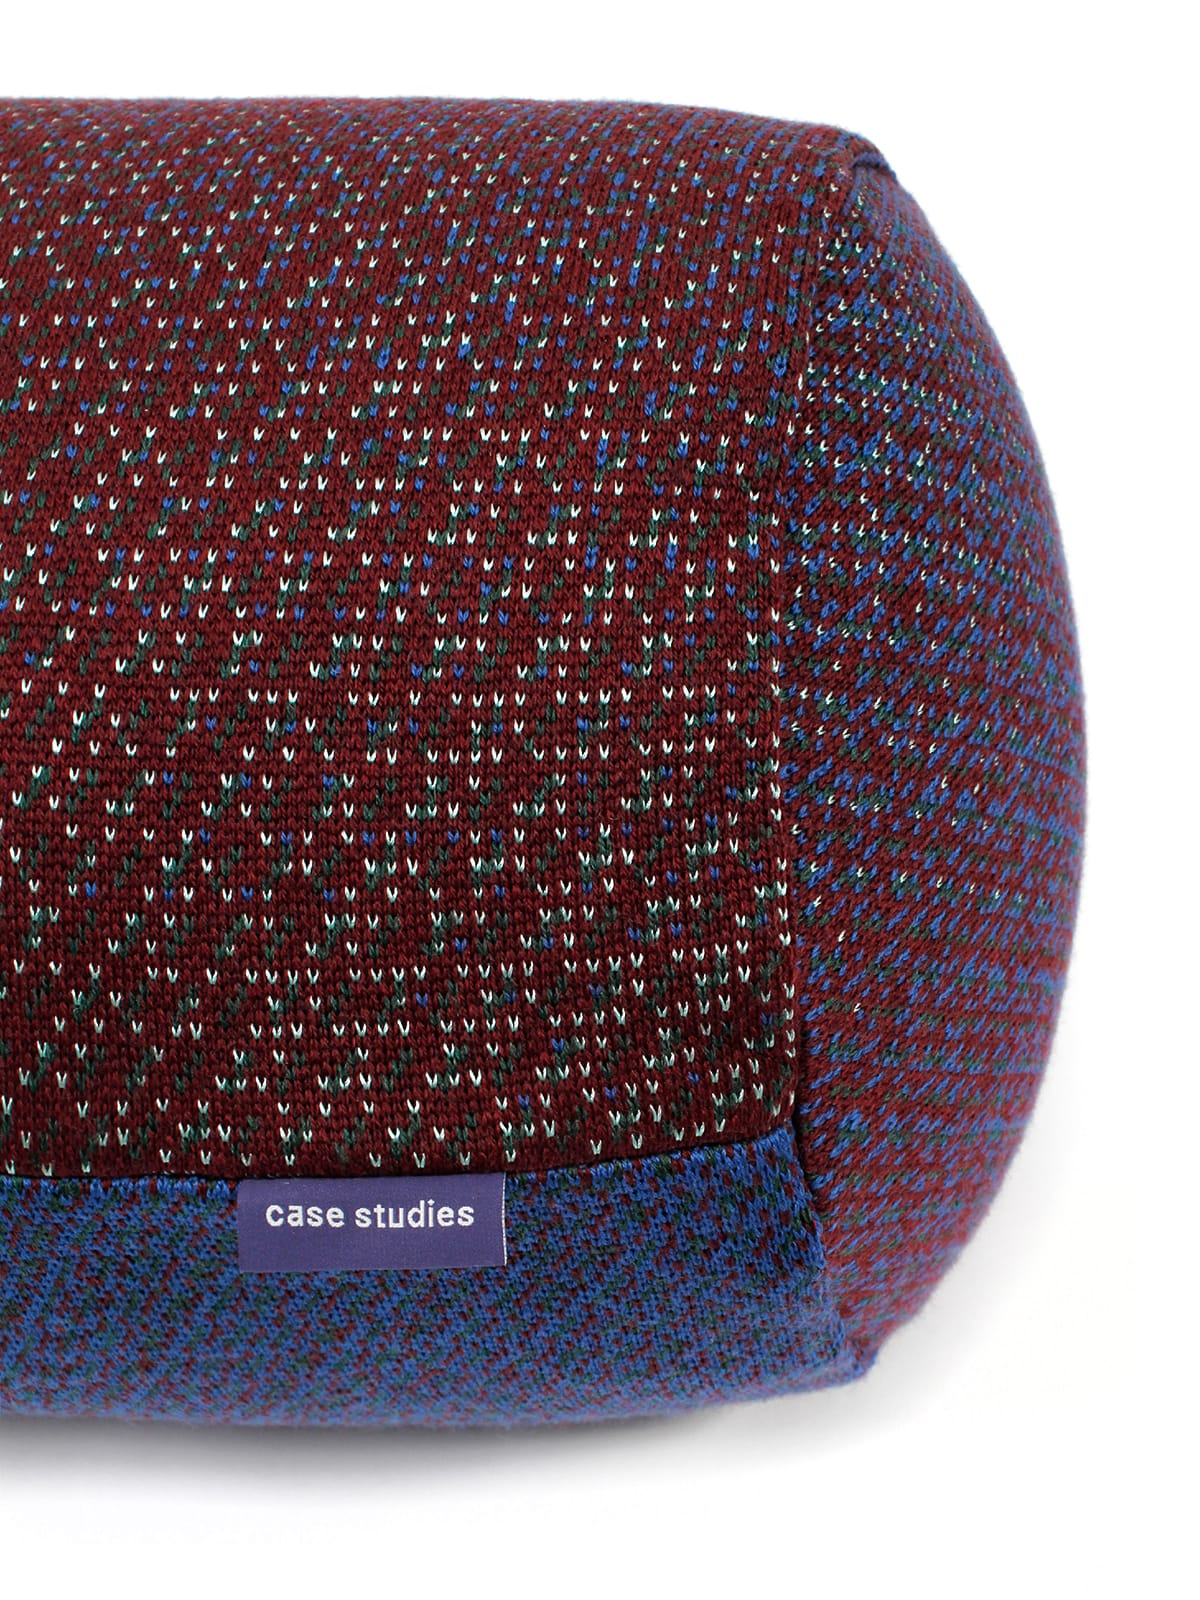 Knitted Bolster 20x70 Venice - Merino Wool details